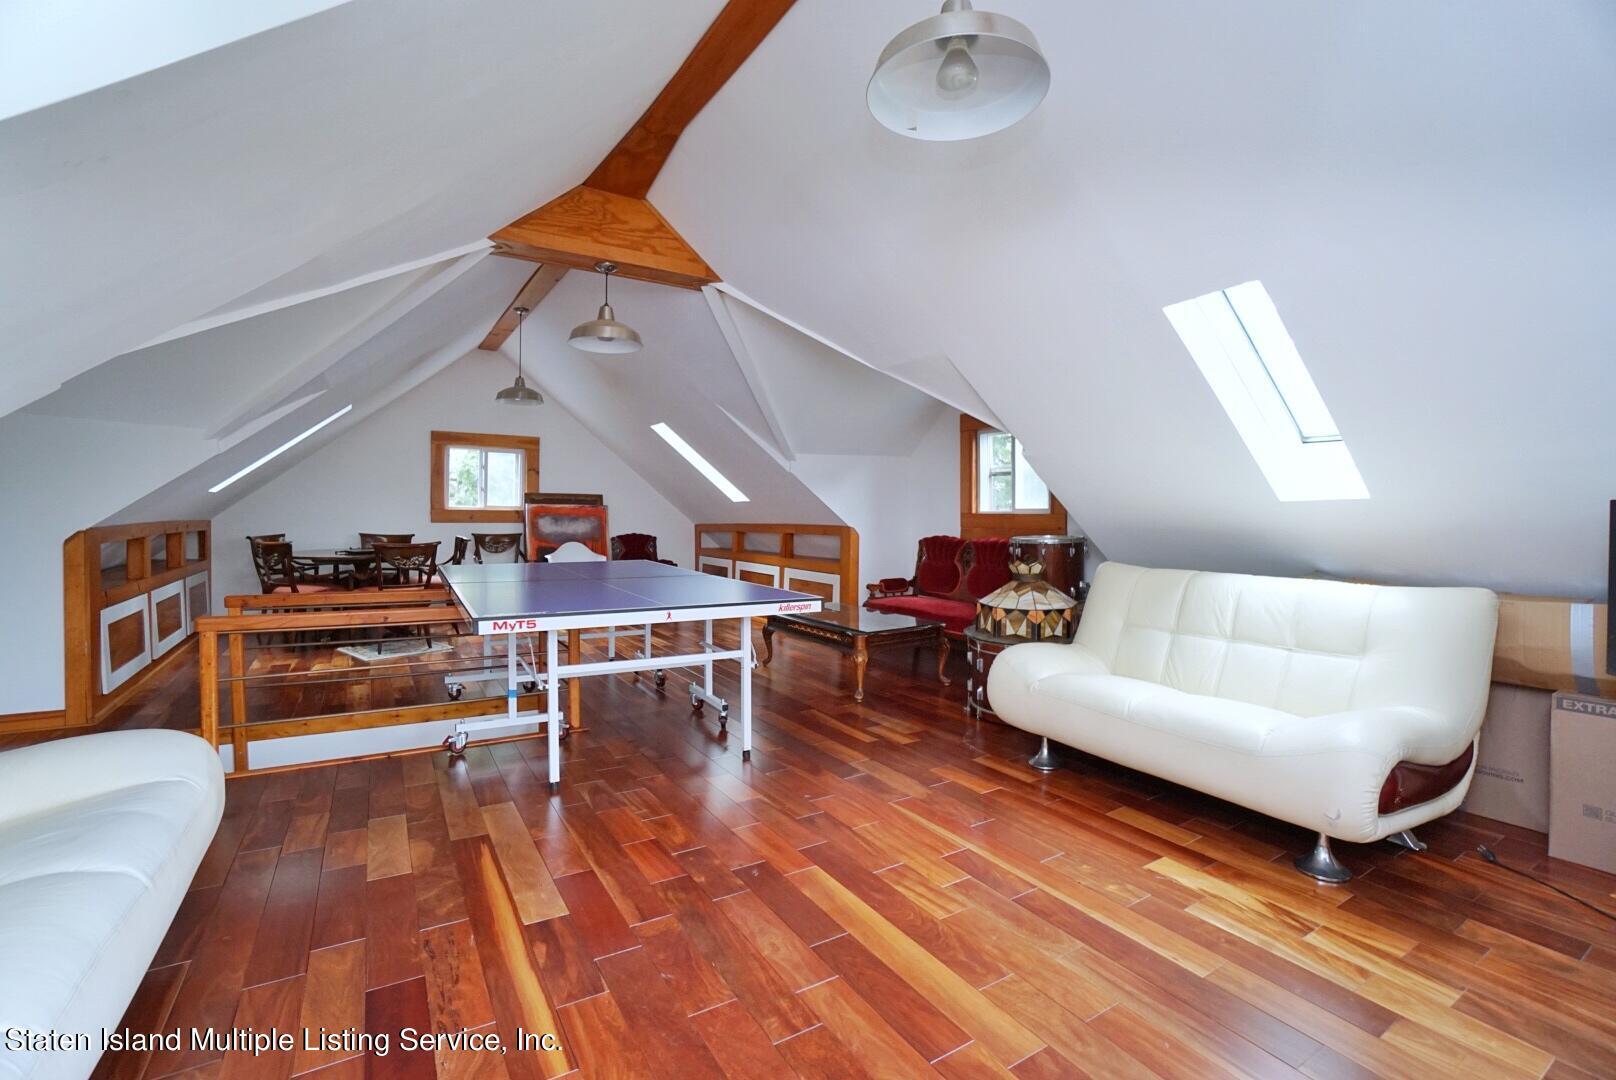 Single Family - Detached 136 York Avenue  Staten Island, NY 10301, MLS-1147575-39